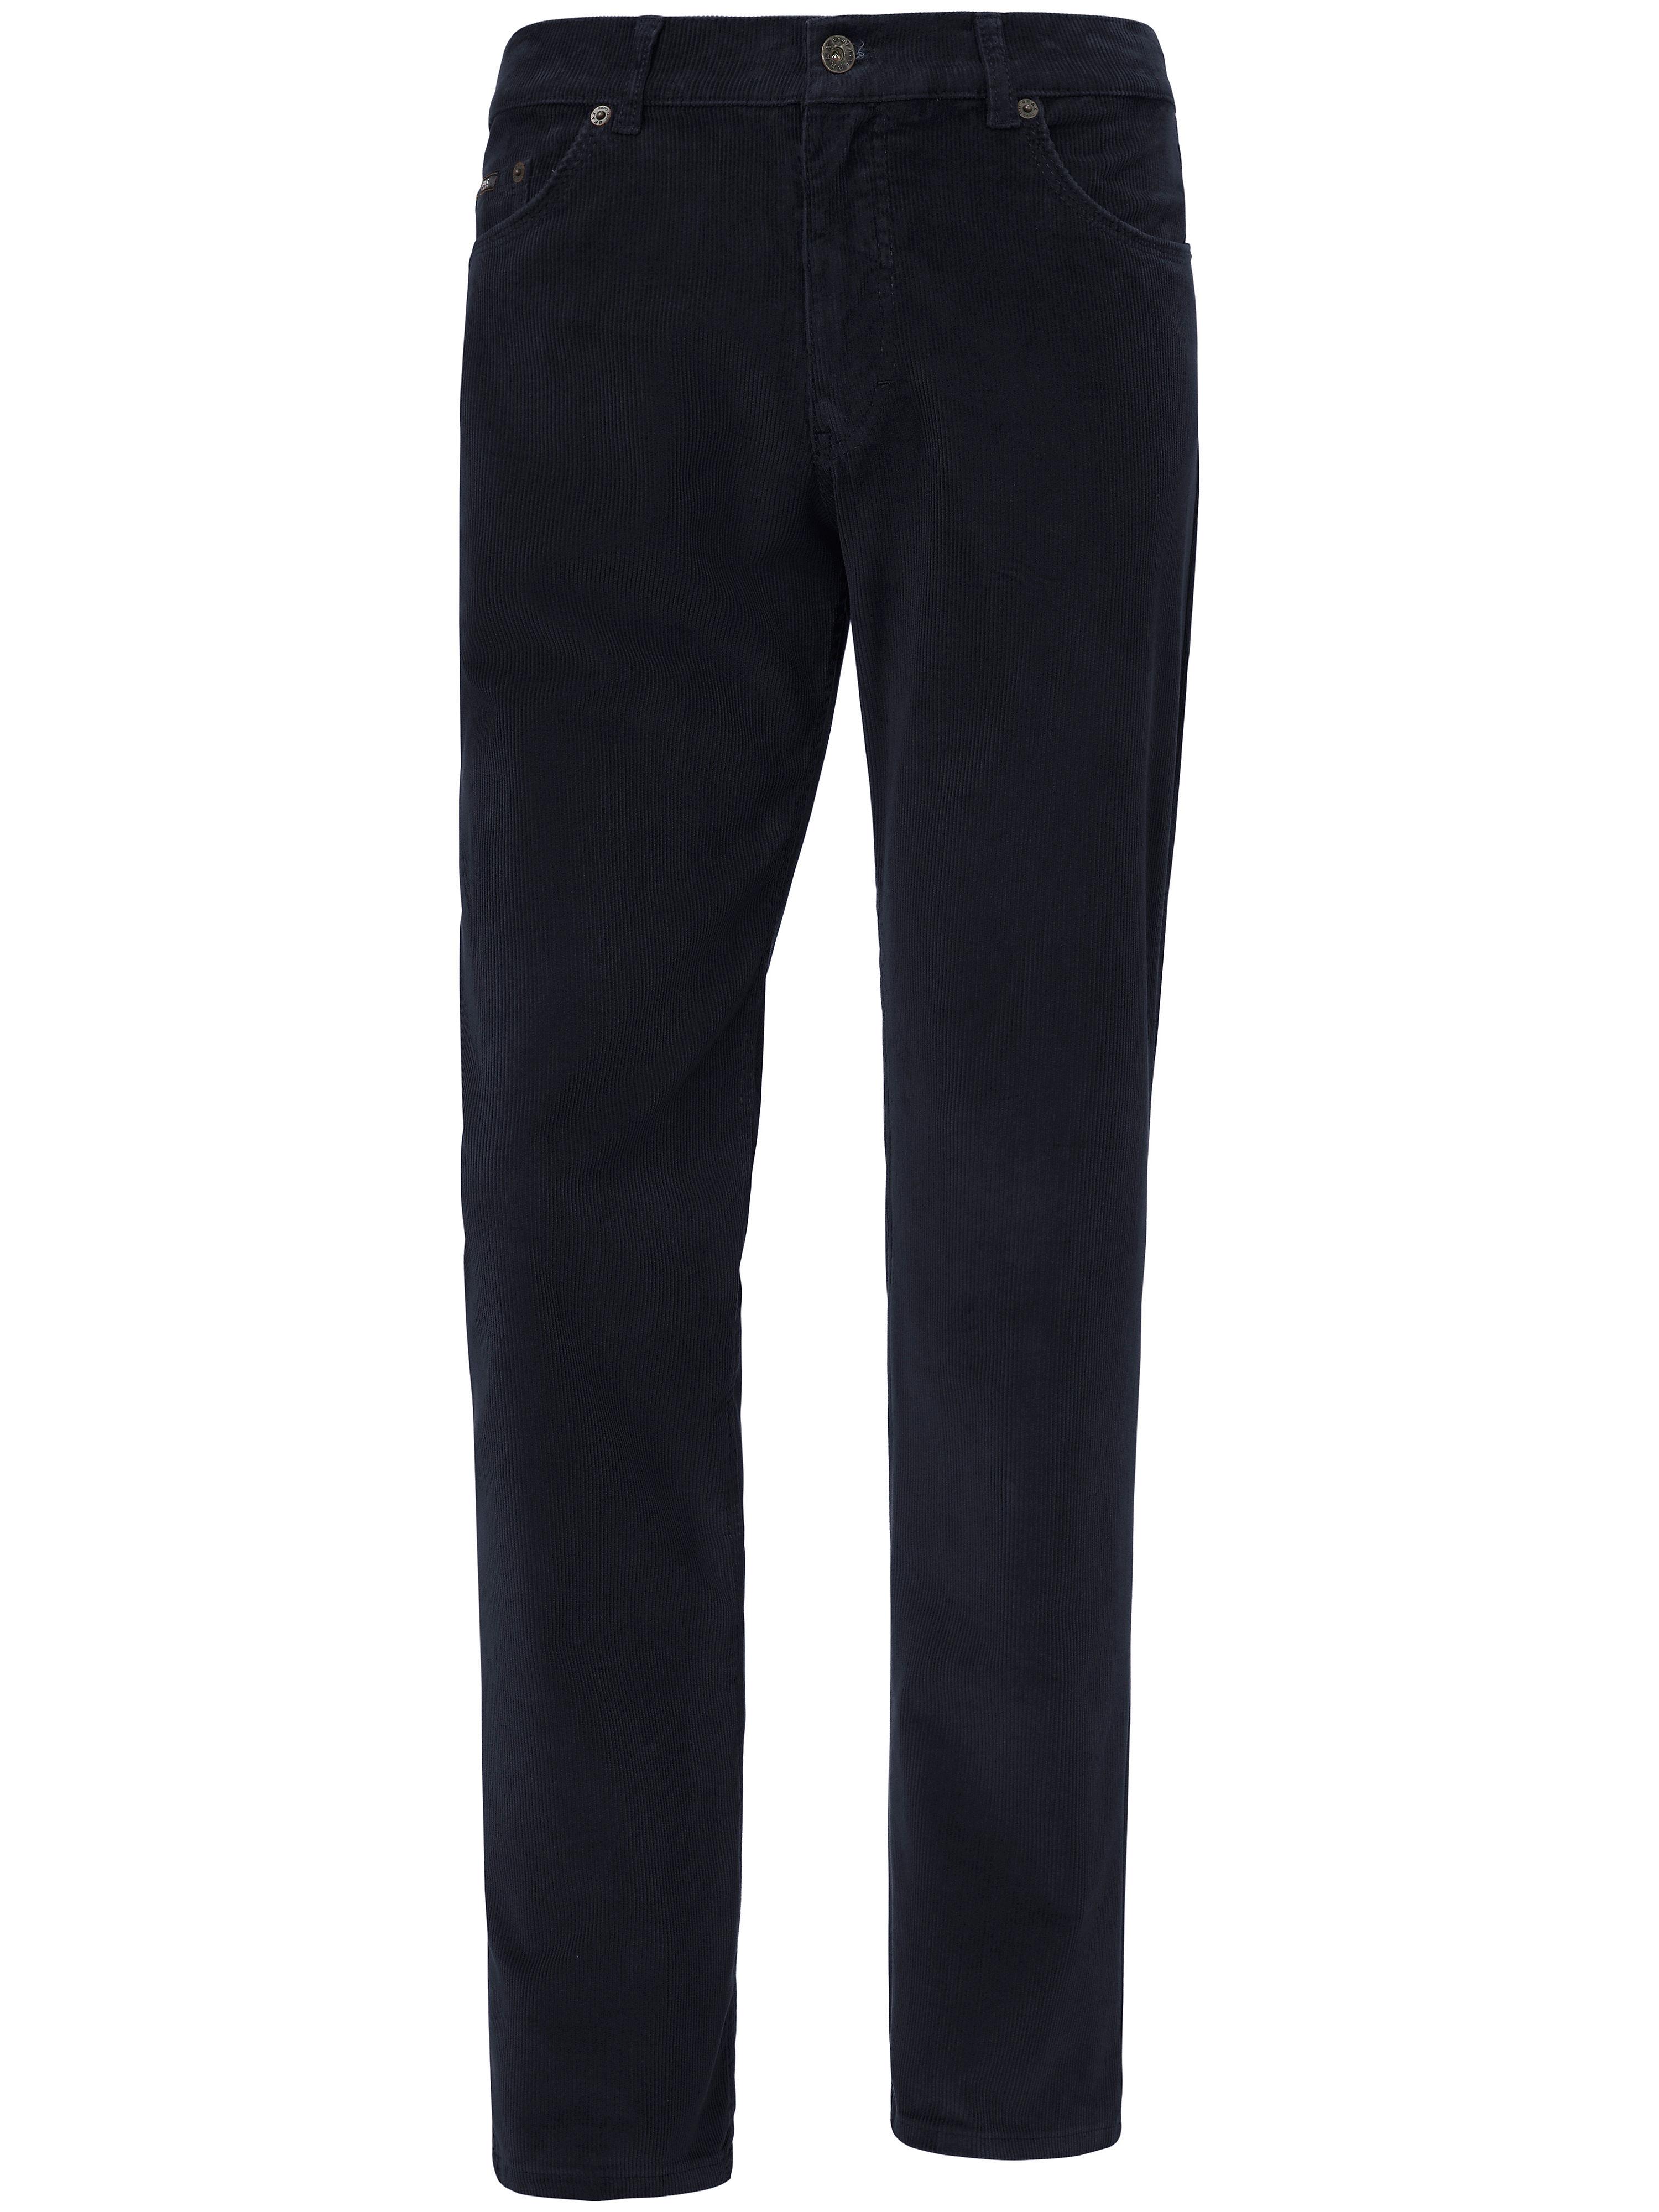 corduroy-trousers-design-cooper-fancy-brax-feel-good-blue